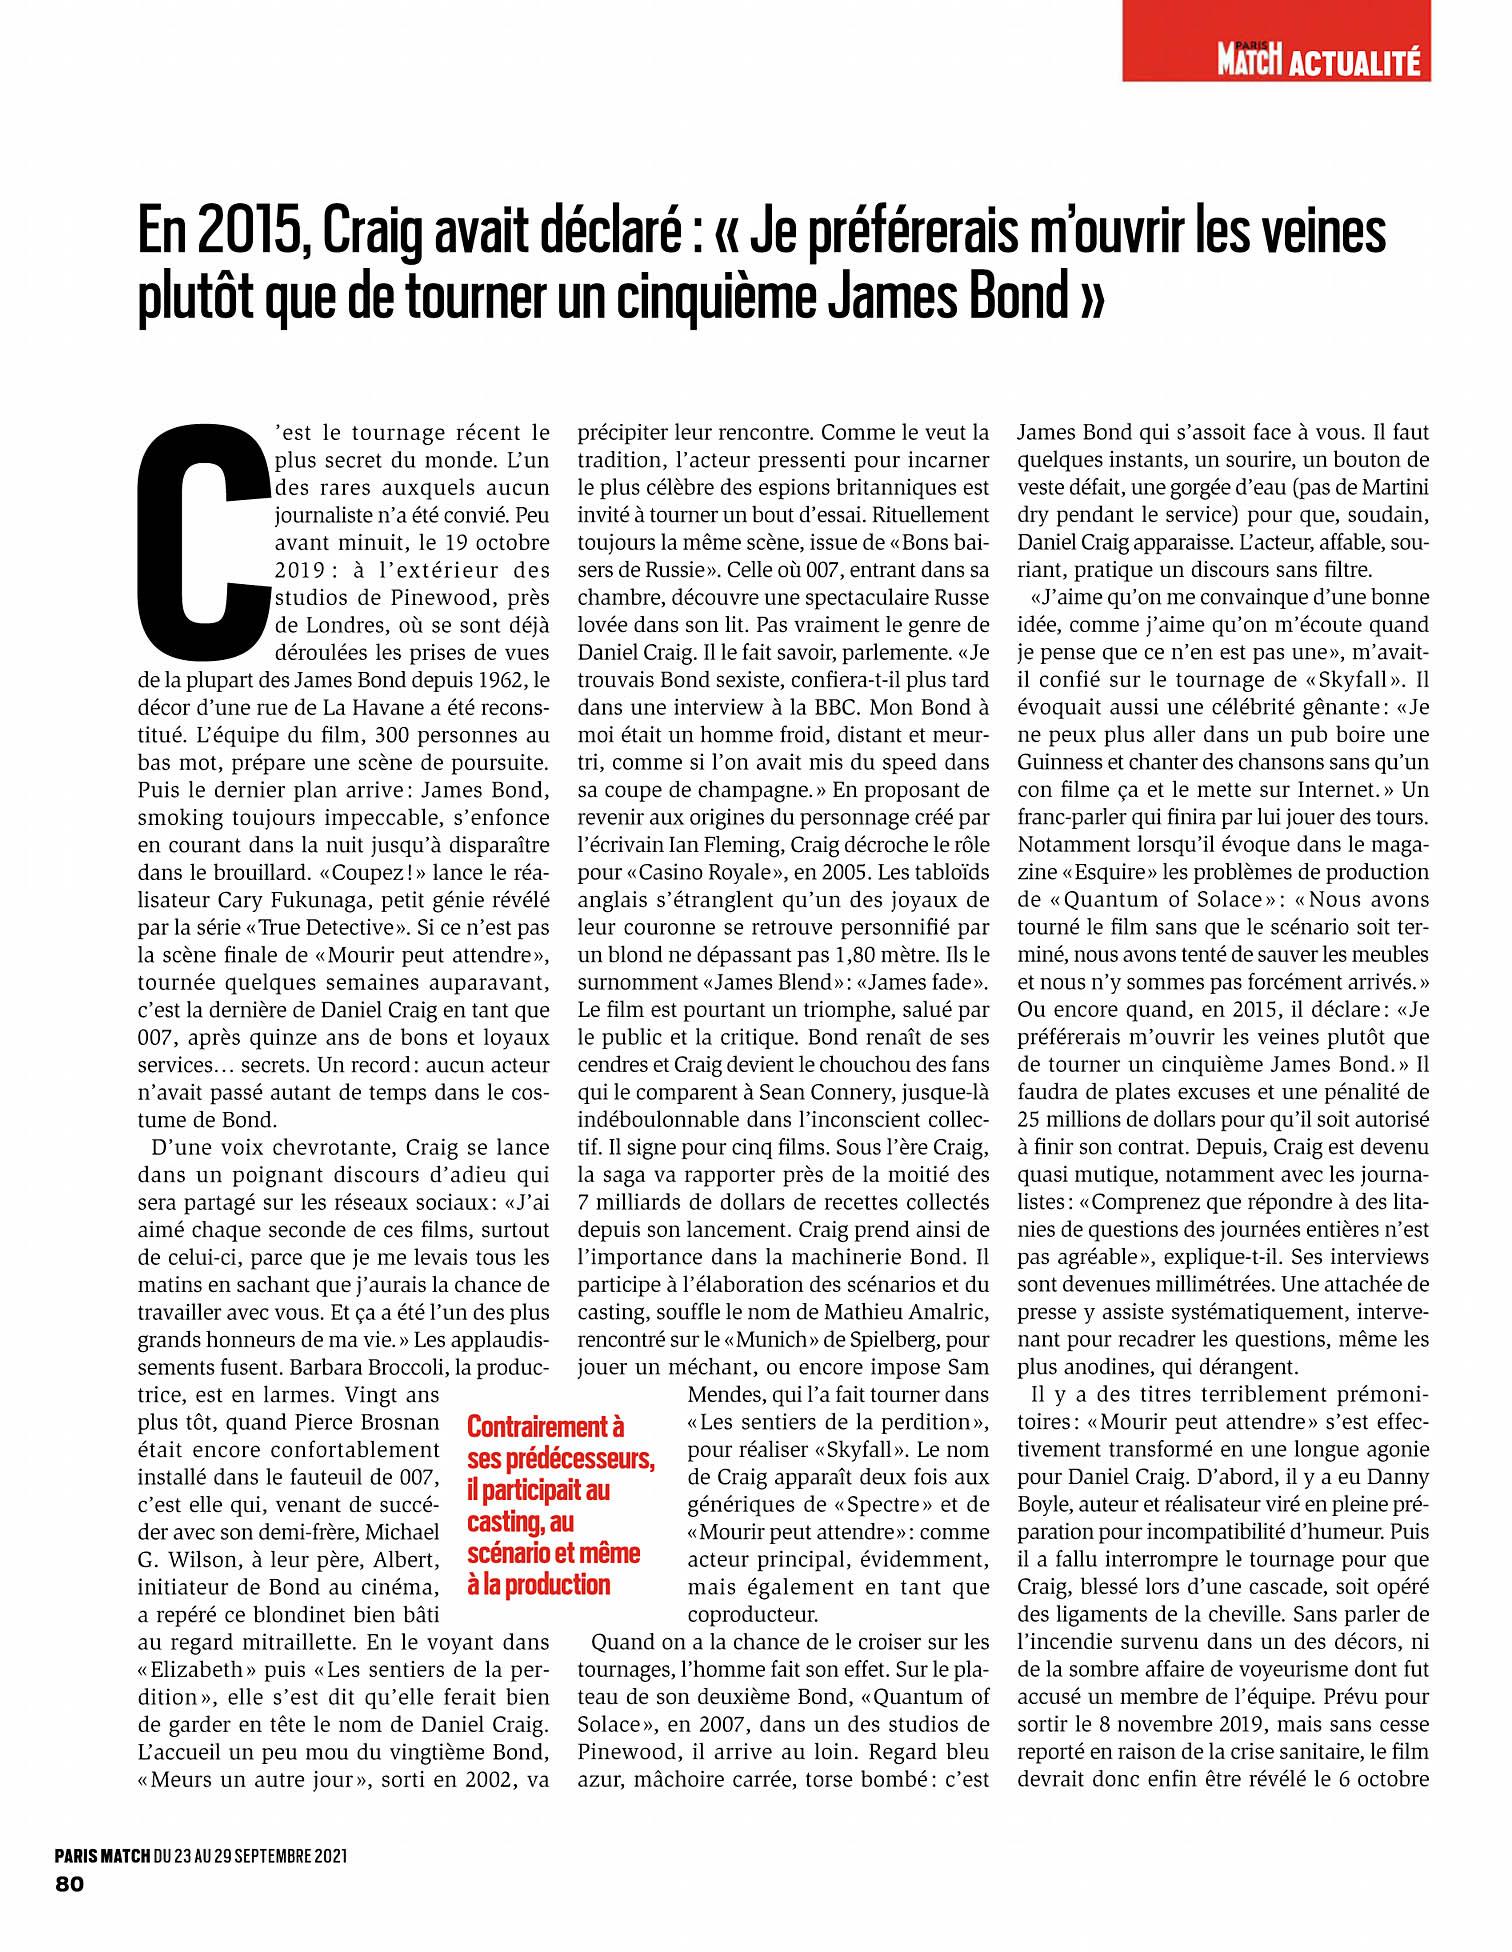 Paris Match 210923 Bond 03.jpg